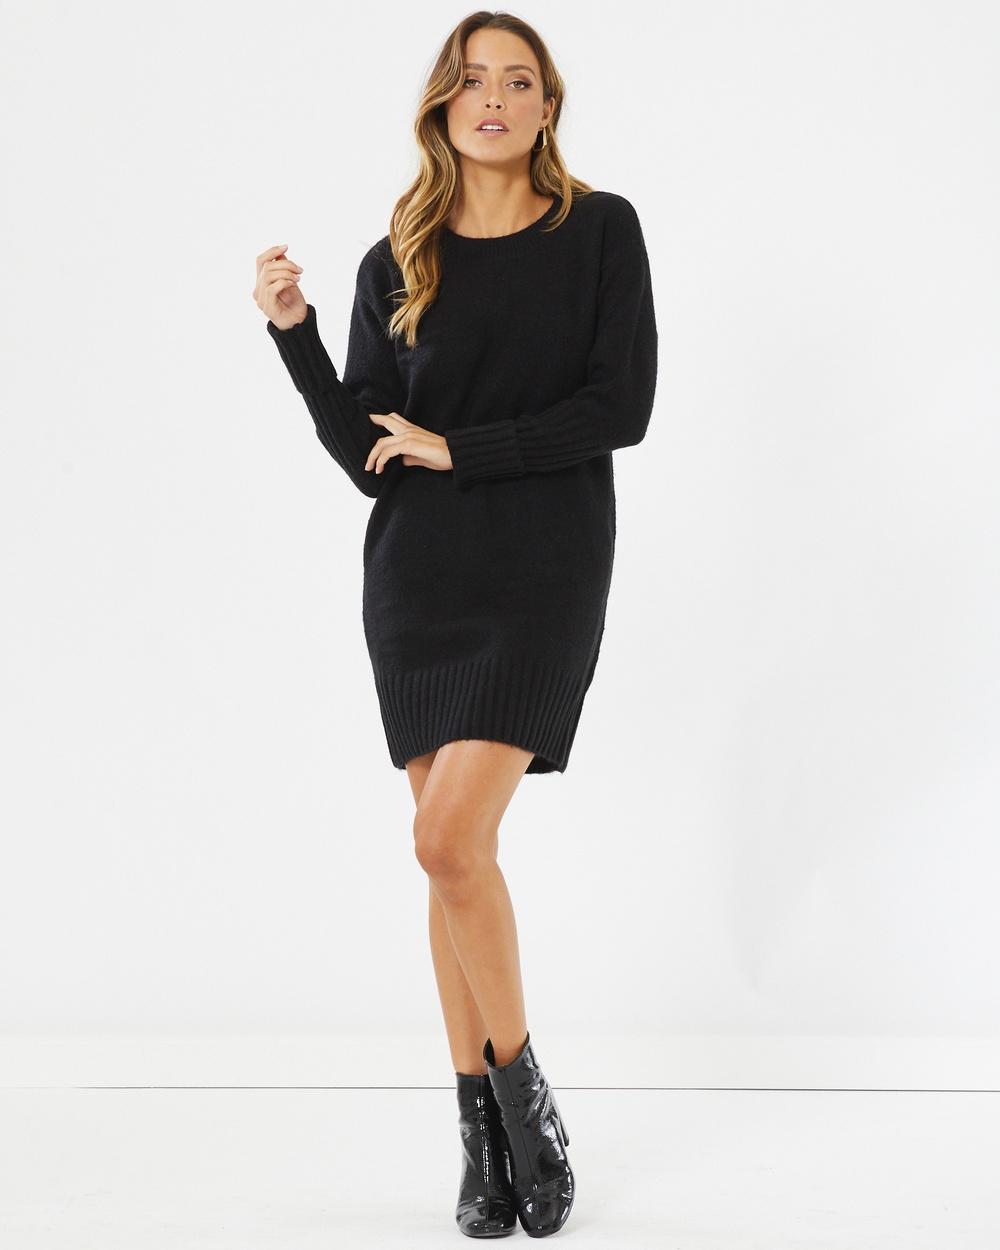 Calli Lulu Jumper Dress Dresses Black Lulu Jumper Dress